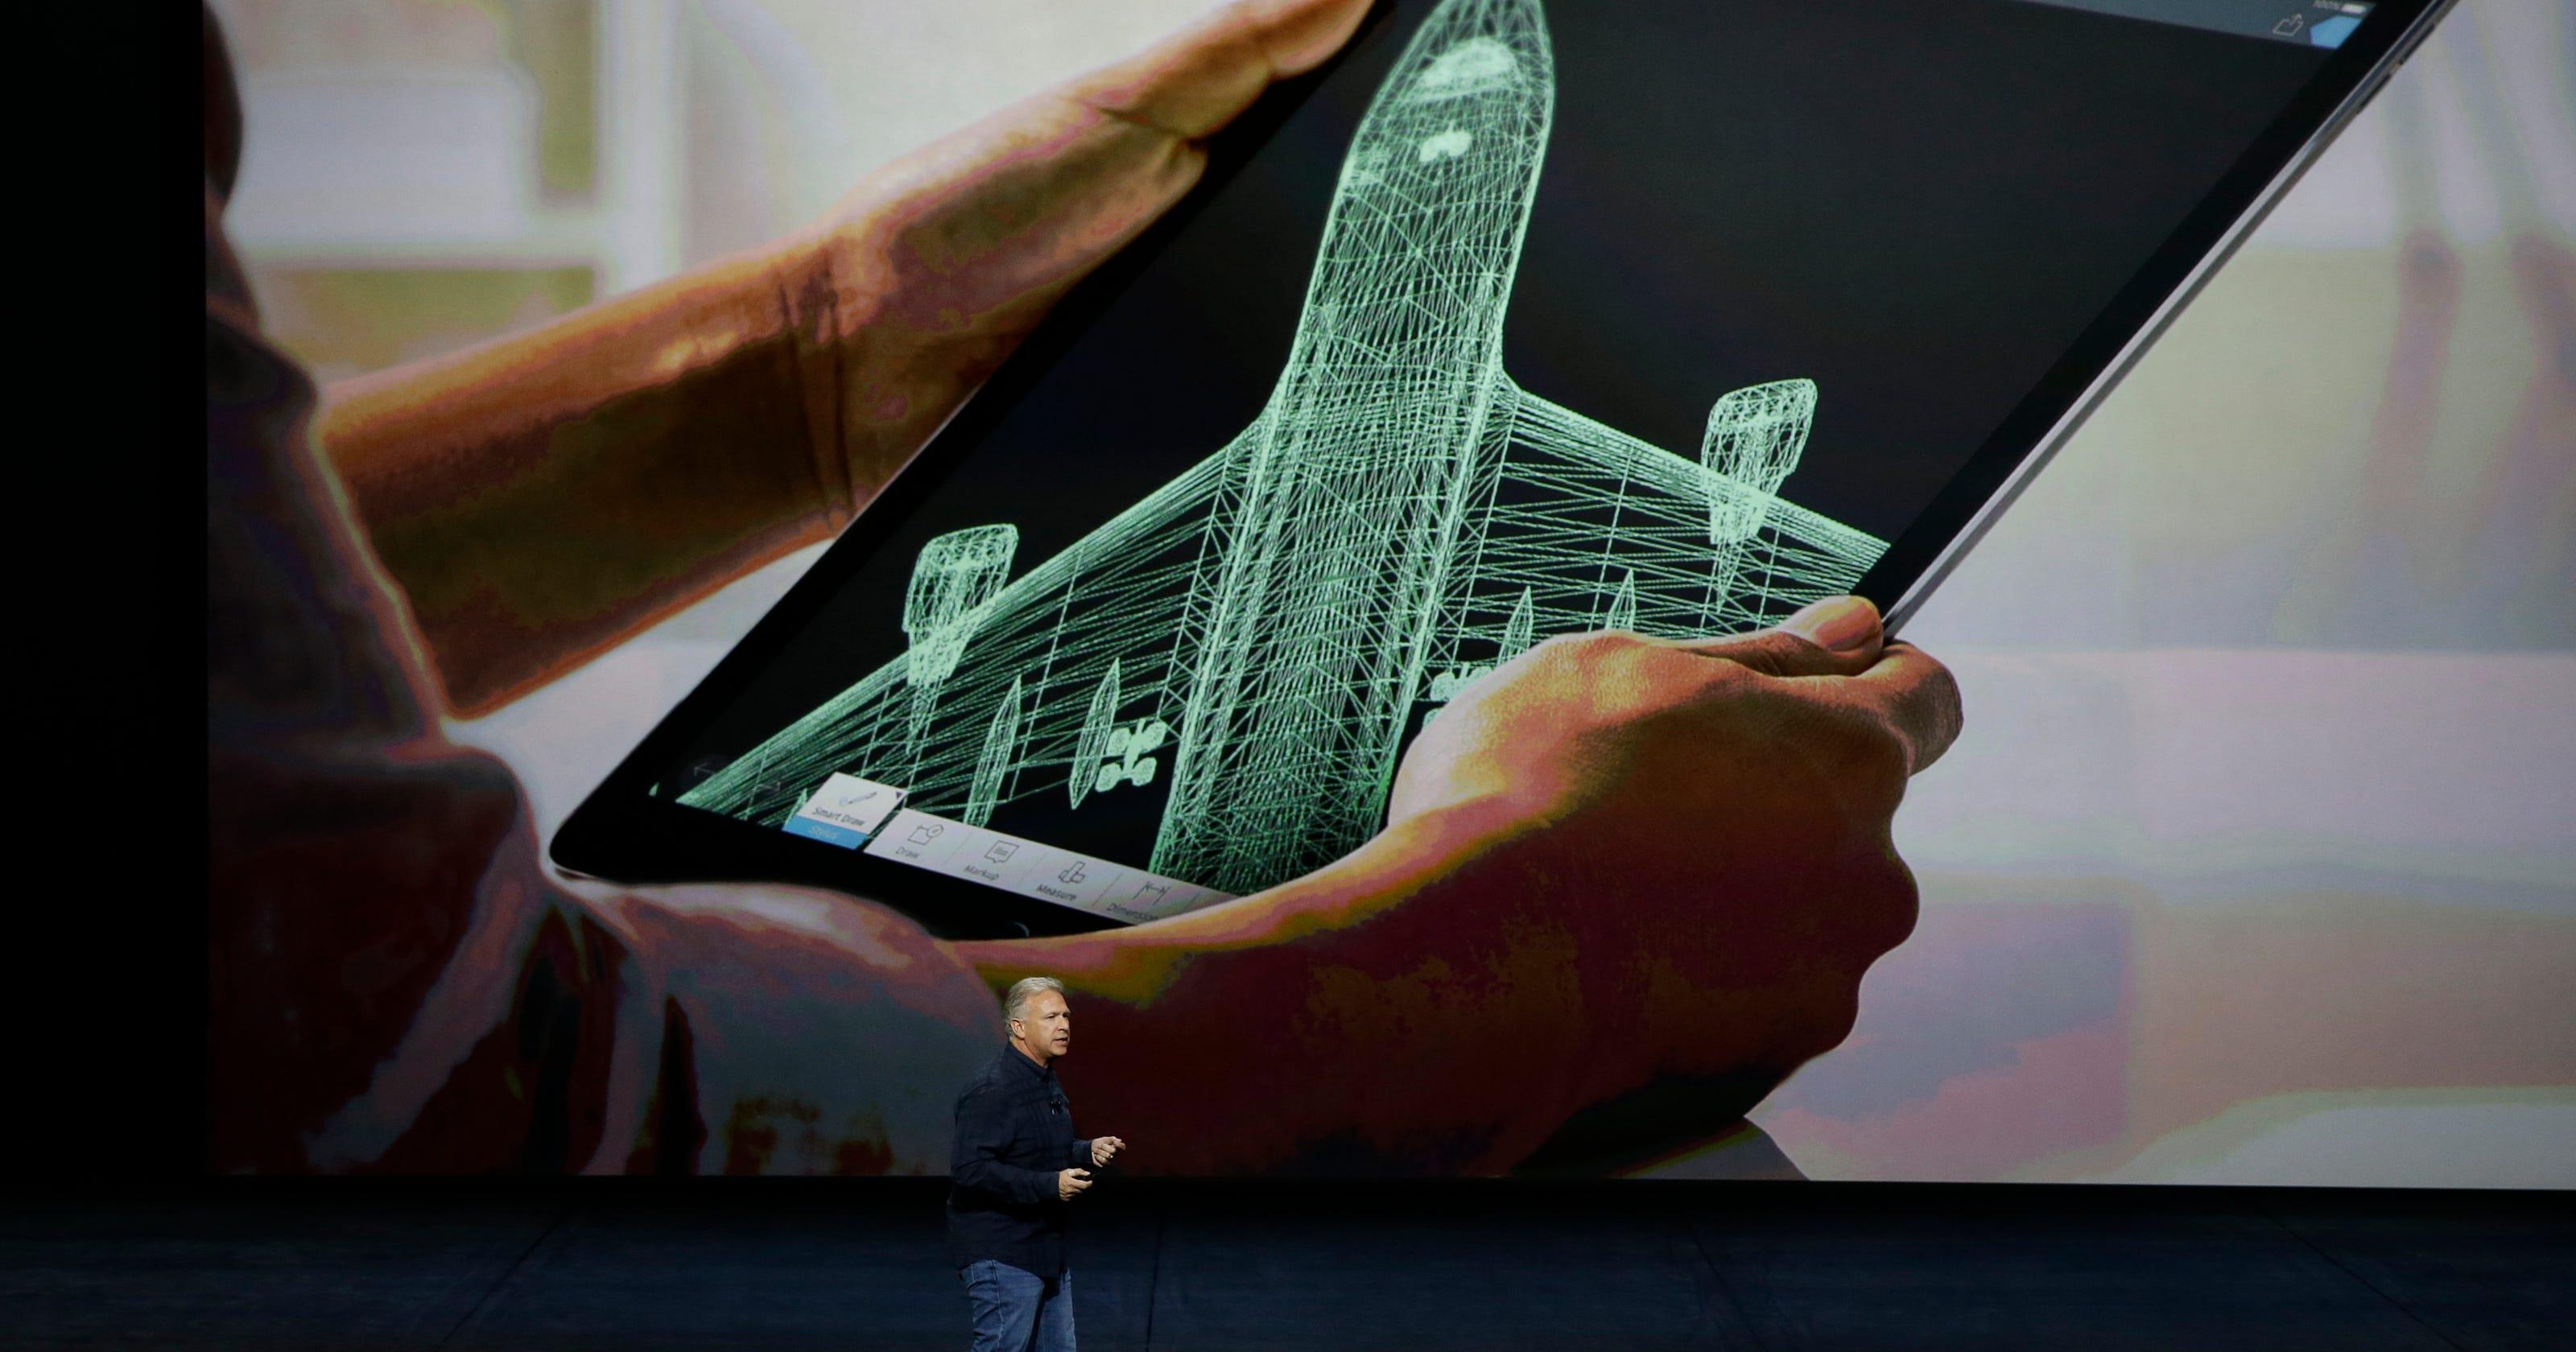 Technobubble: Apple unveils new iPad Pro, Apple TV, iPhone